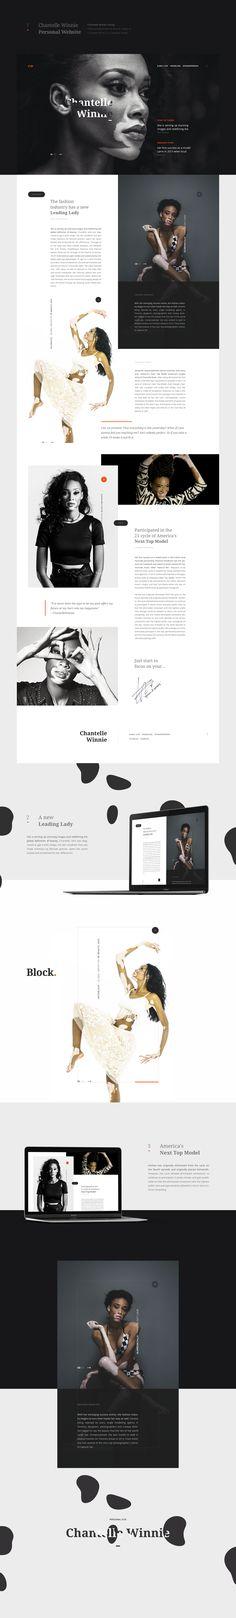 Chantelle Winnie Personal Website on Behance #site #web #website #ui #ux #design #bw #fashion